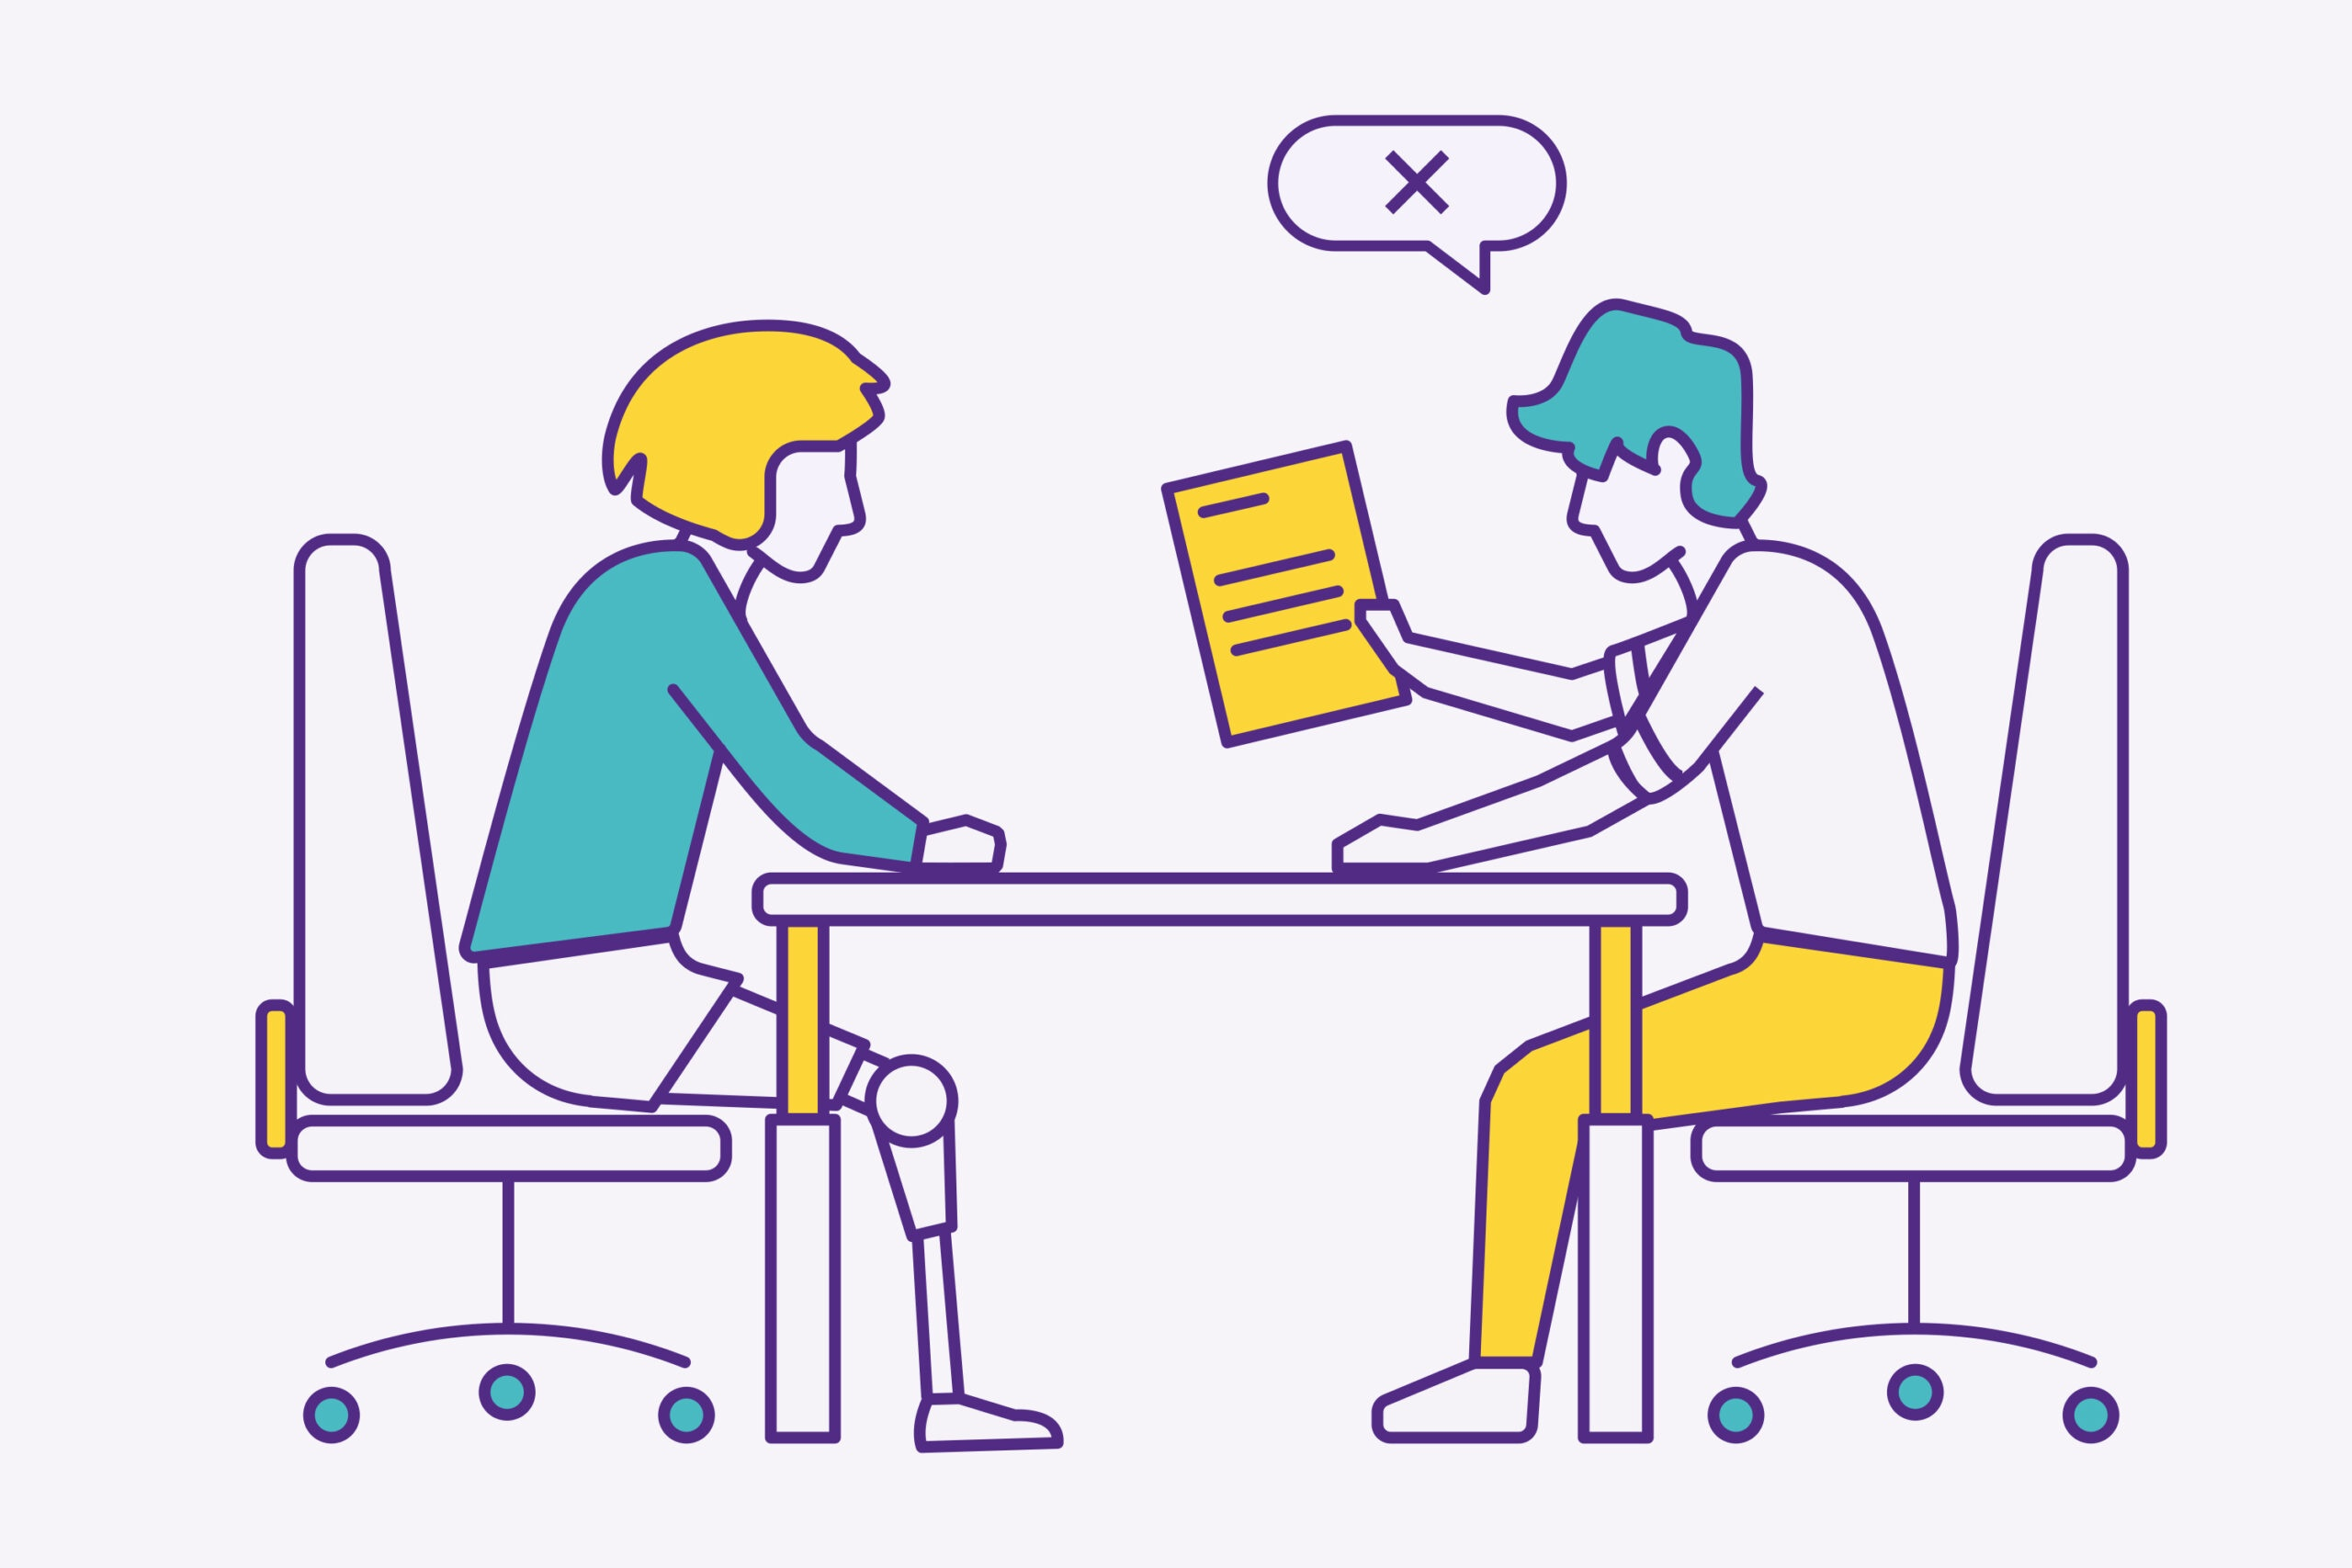 Illustration showing discrimination against disabled people